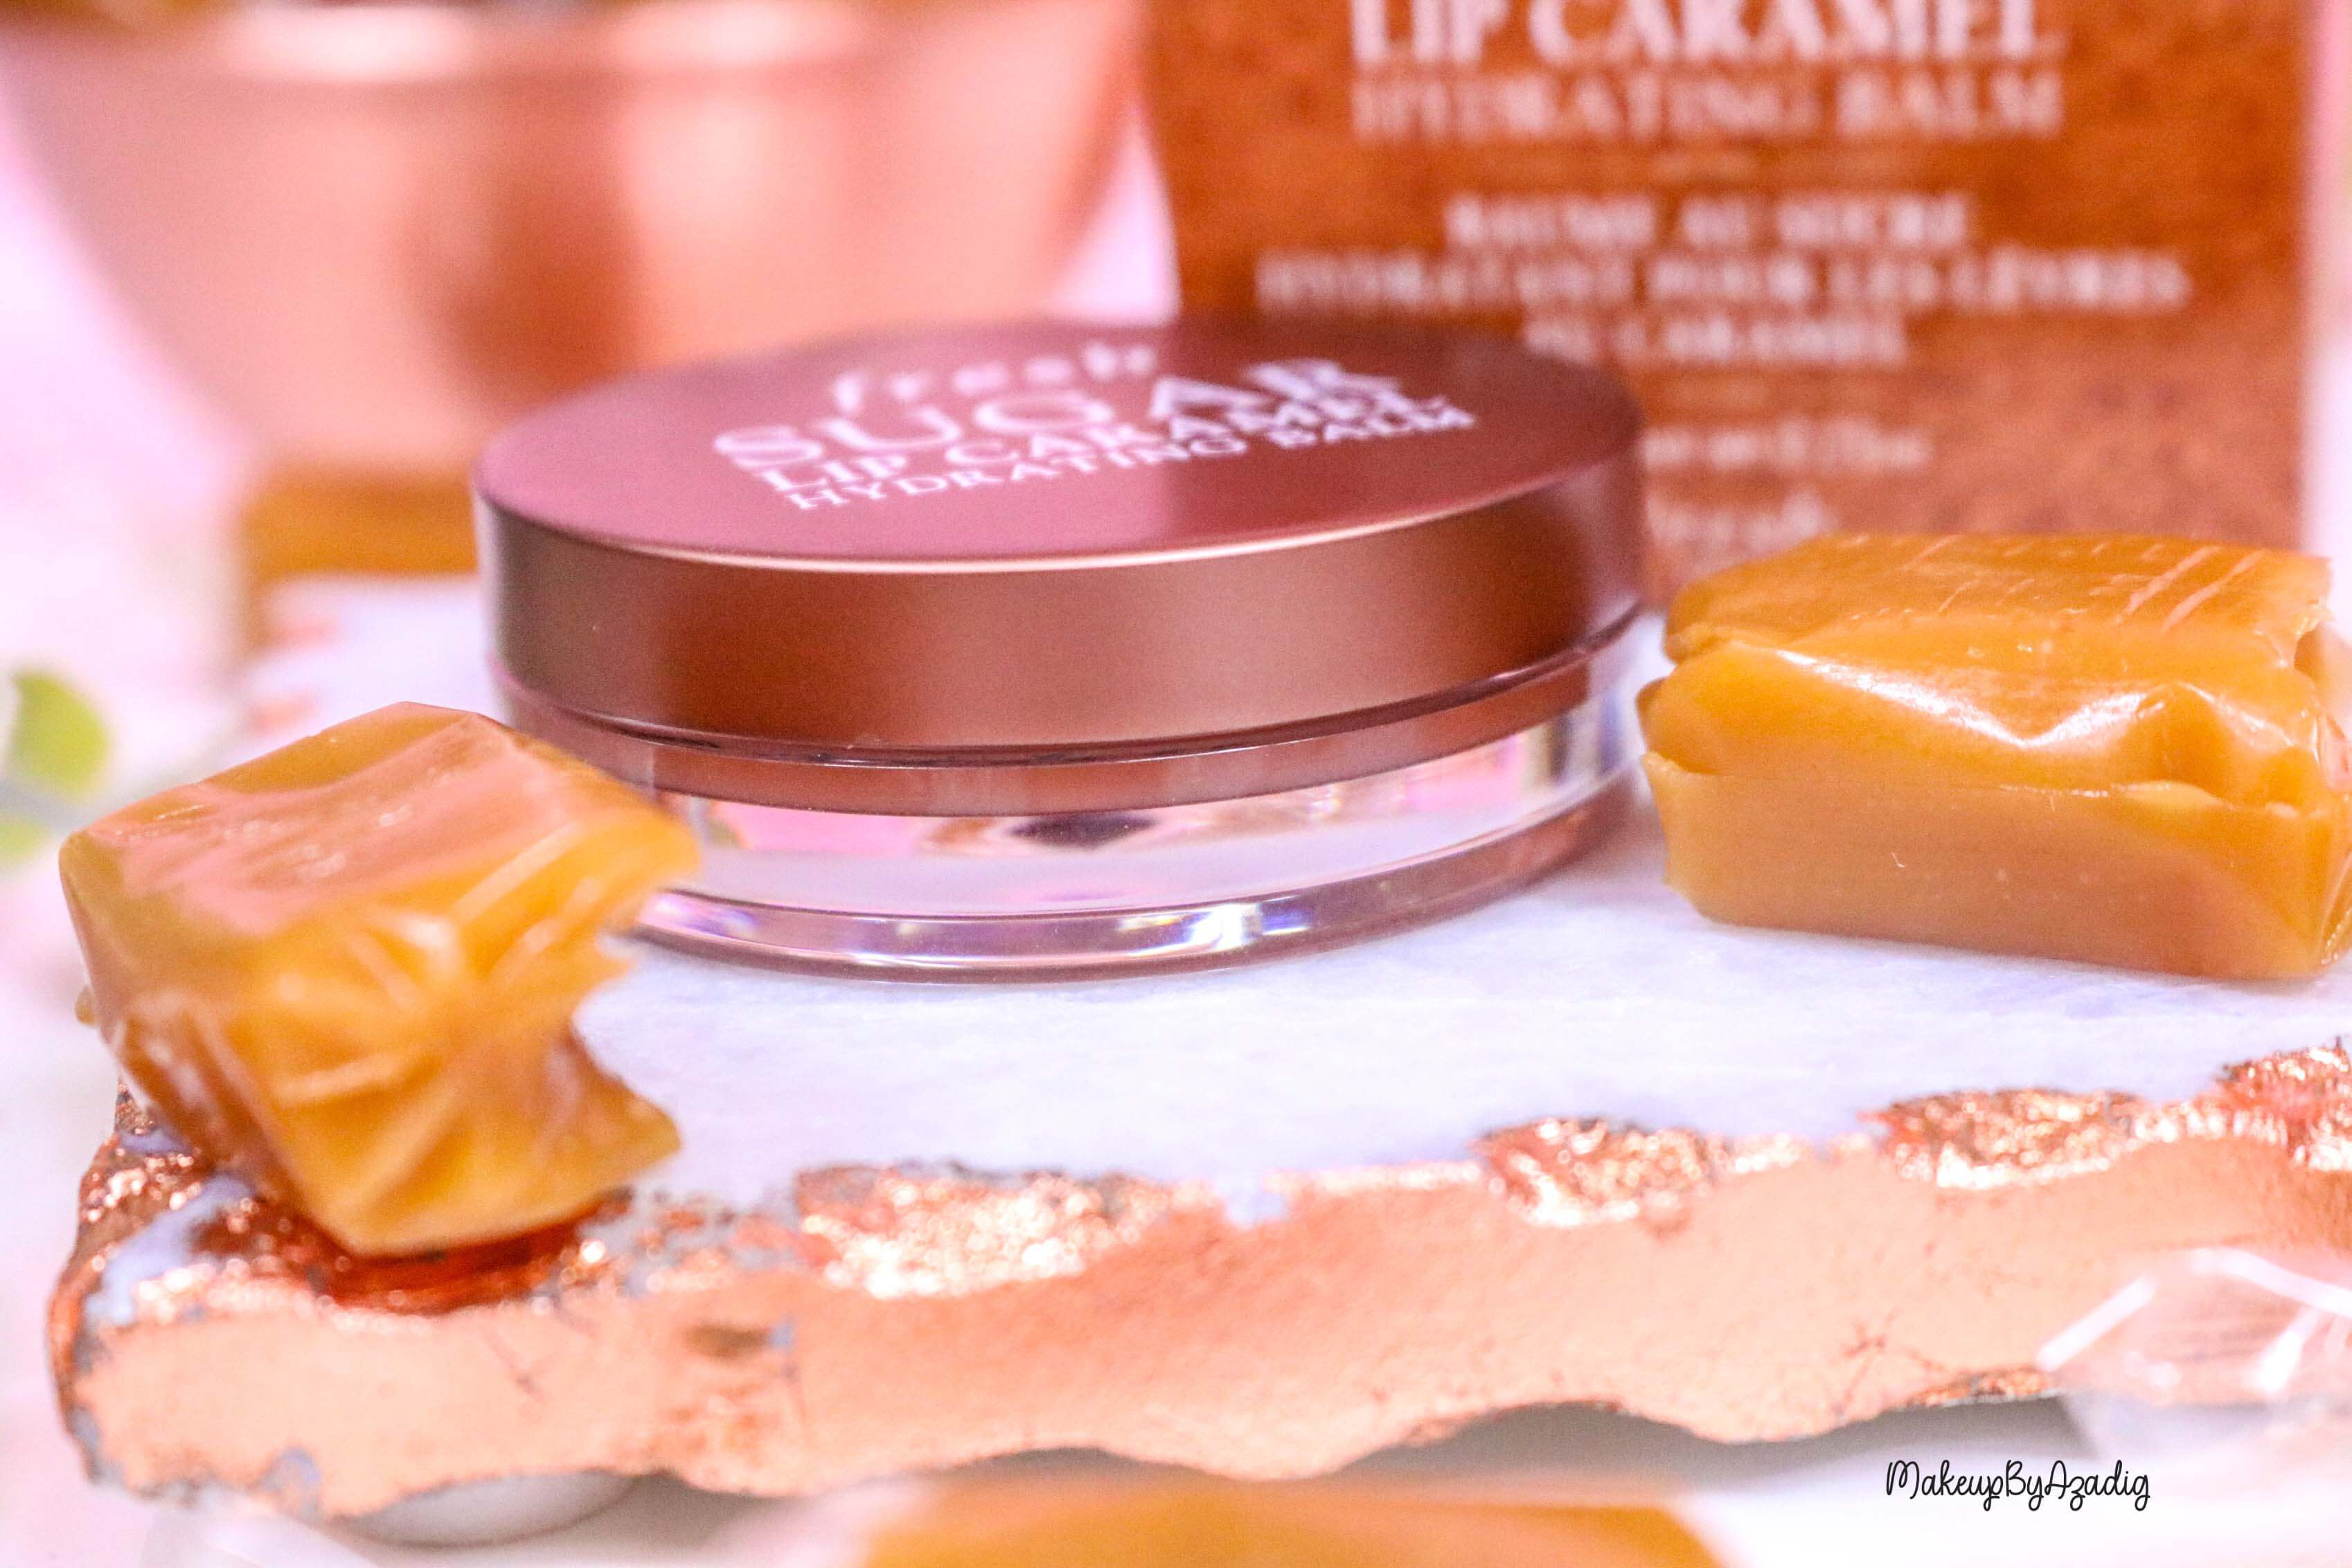 revue-baume-sucre-fresh-beauty-skincare-caramel-sugar-lip-caramel-sephora-makeupbyazadig-avis-prix-balm-boite